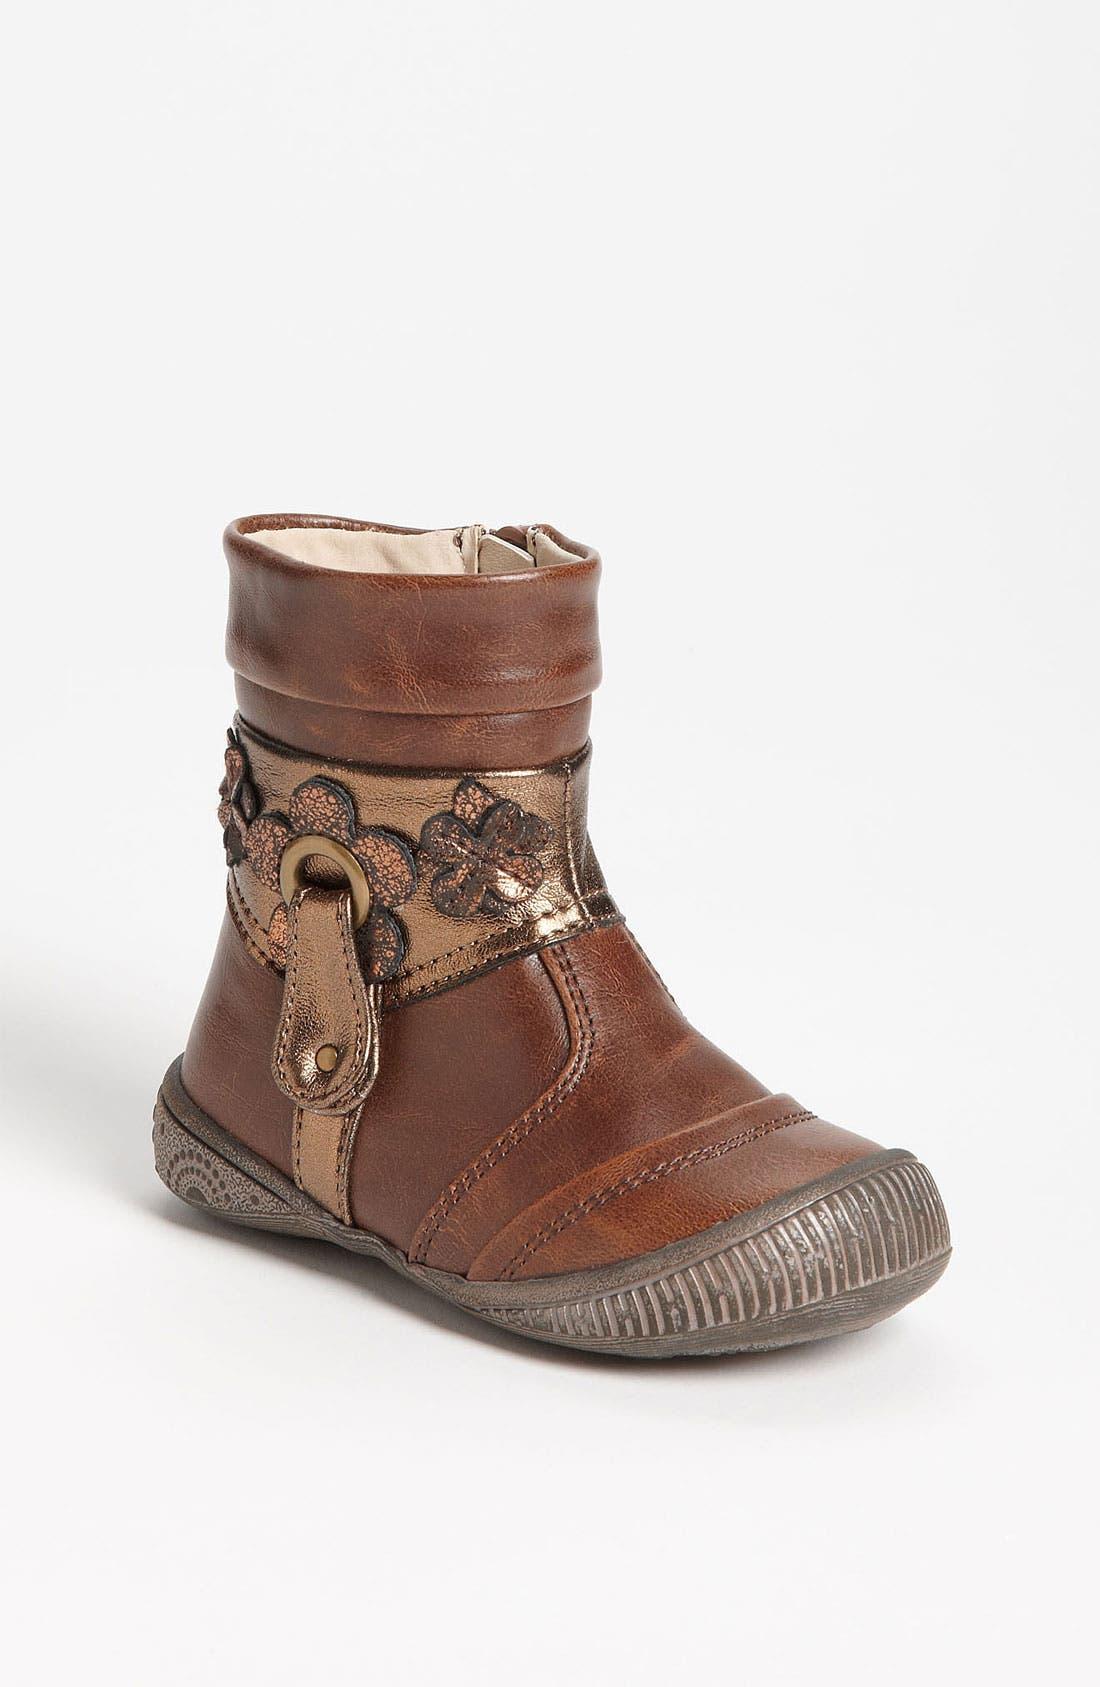 Alternate Image 1 Selected - kensie girl 'Flower' Boot (Walker & Toddler)